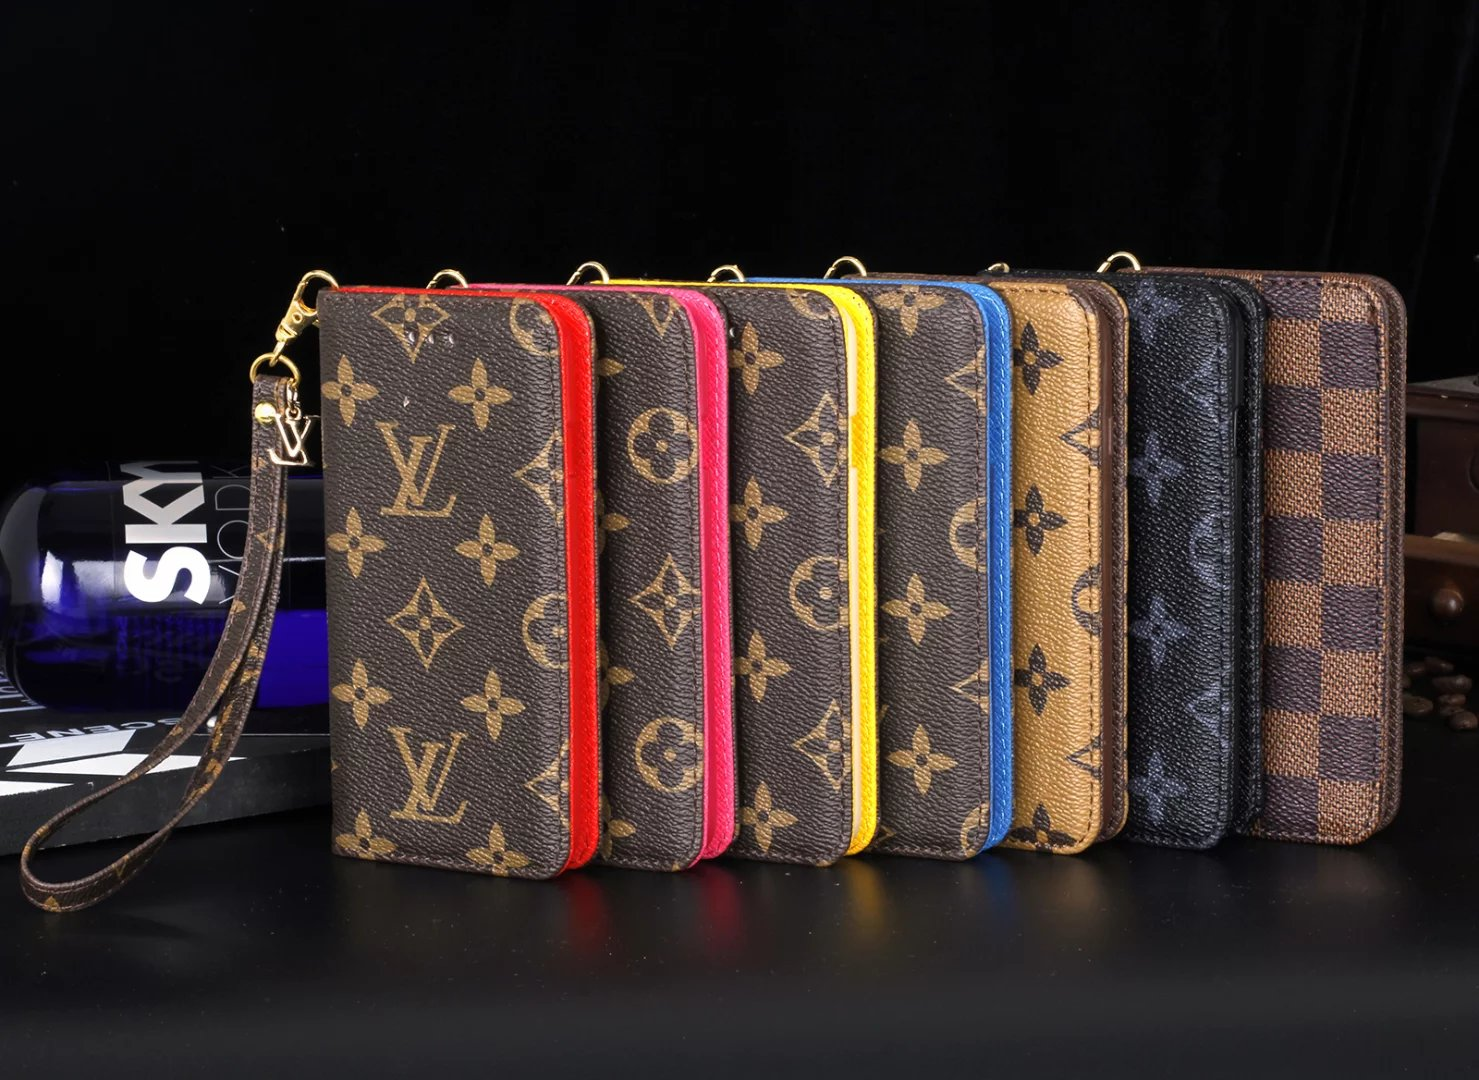 filzhülle iphone iphone hüllen shop Louis Vuitton iphone6s hülle iphone cover mit eigenem foto schutzhülle i phone 6s iphone 6s hülle dünn handyhülle 6slber machen iphone 6s s hülle leder iphone das neueste